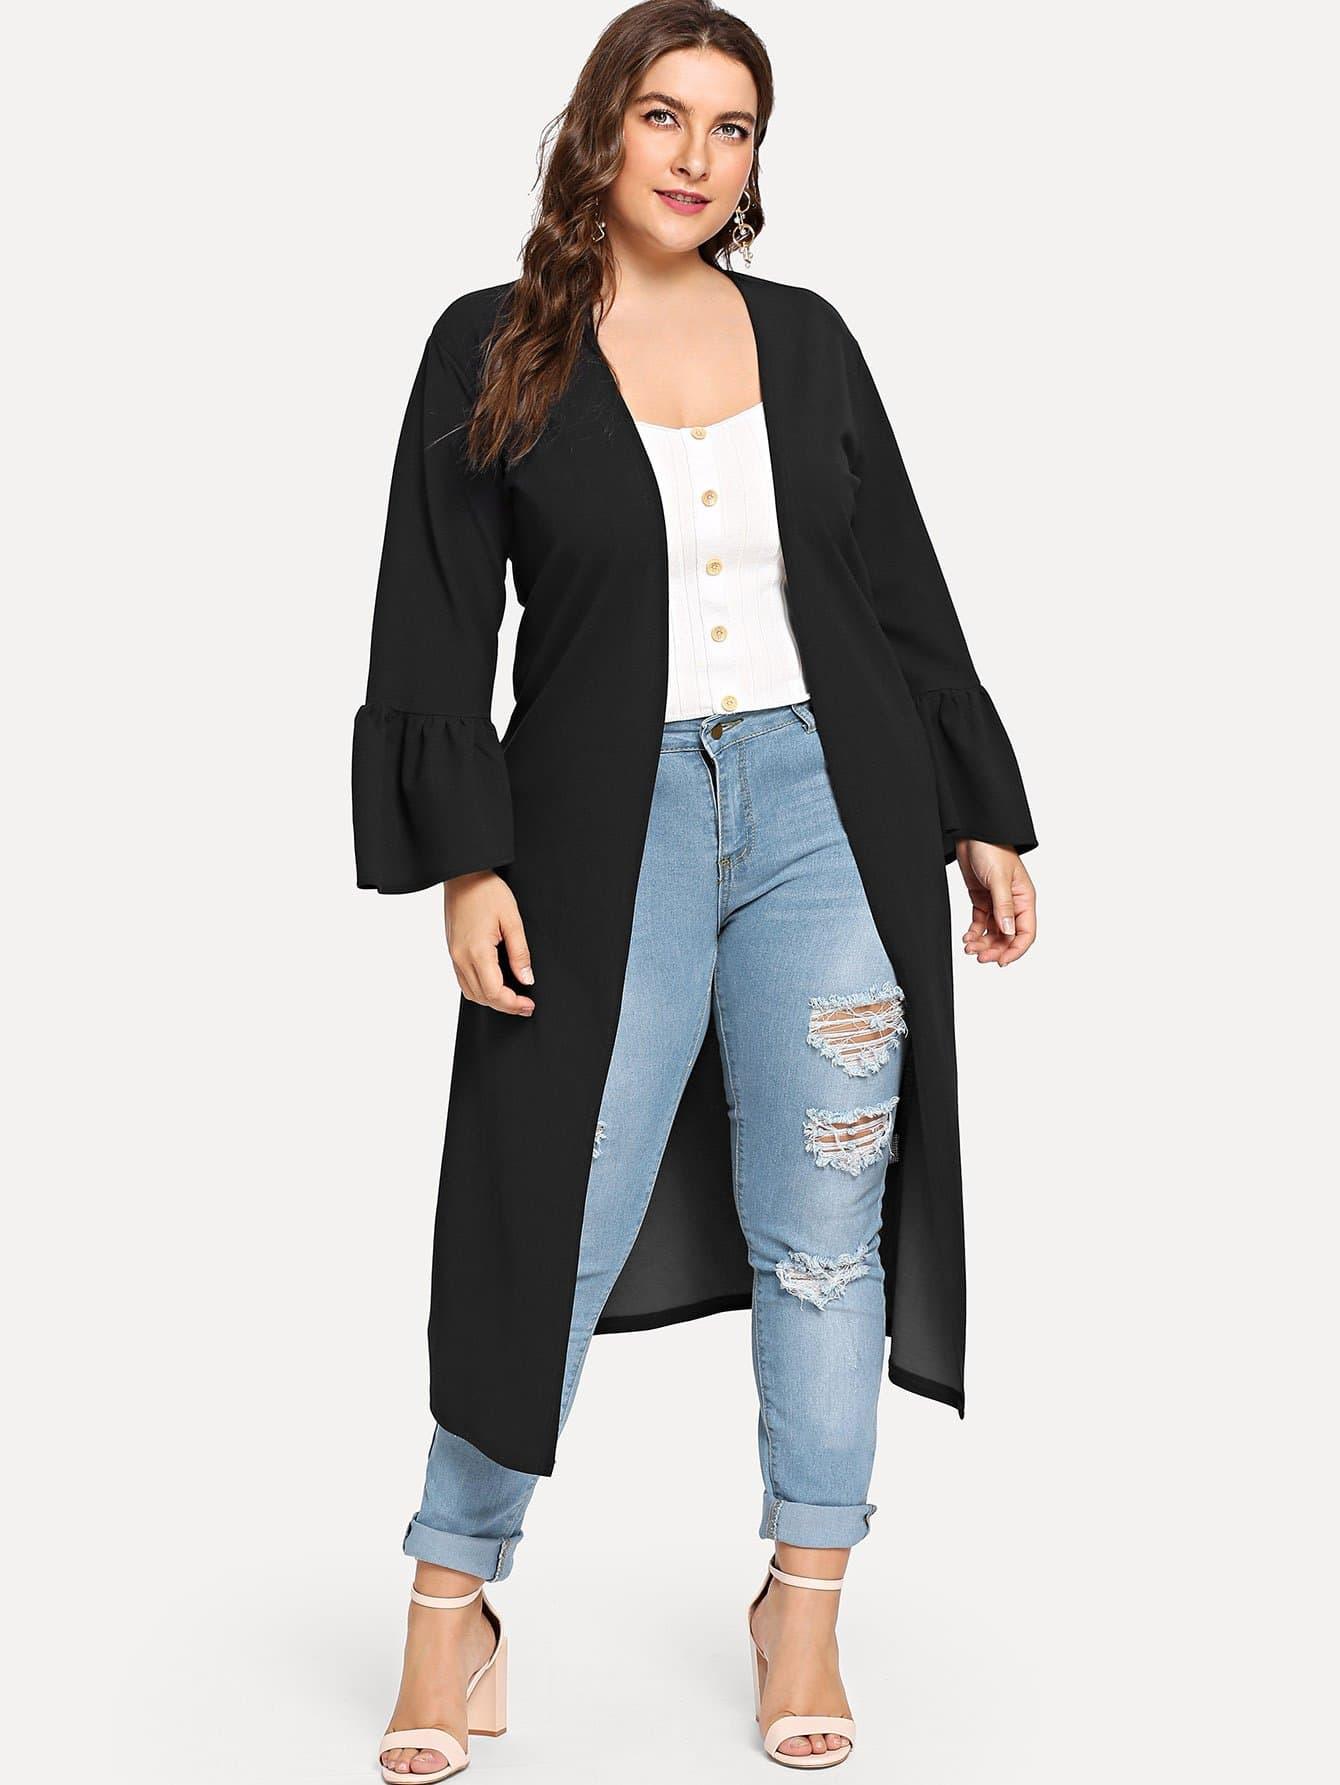 Куртка с широкими рукавами, Franziska, SheIn  - купить со скидкой